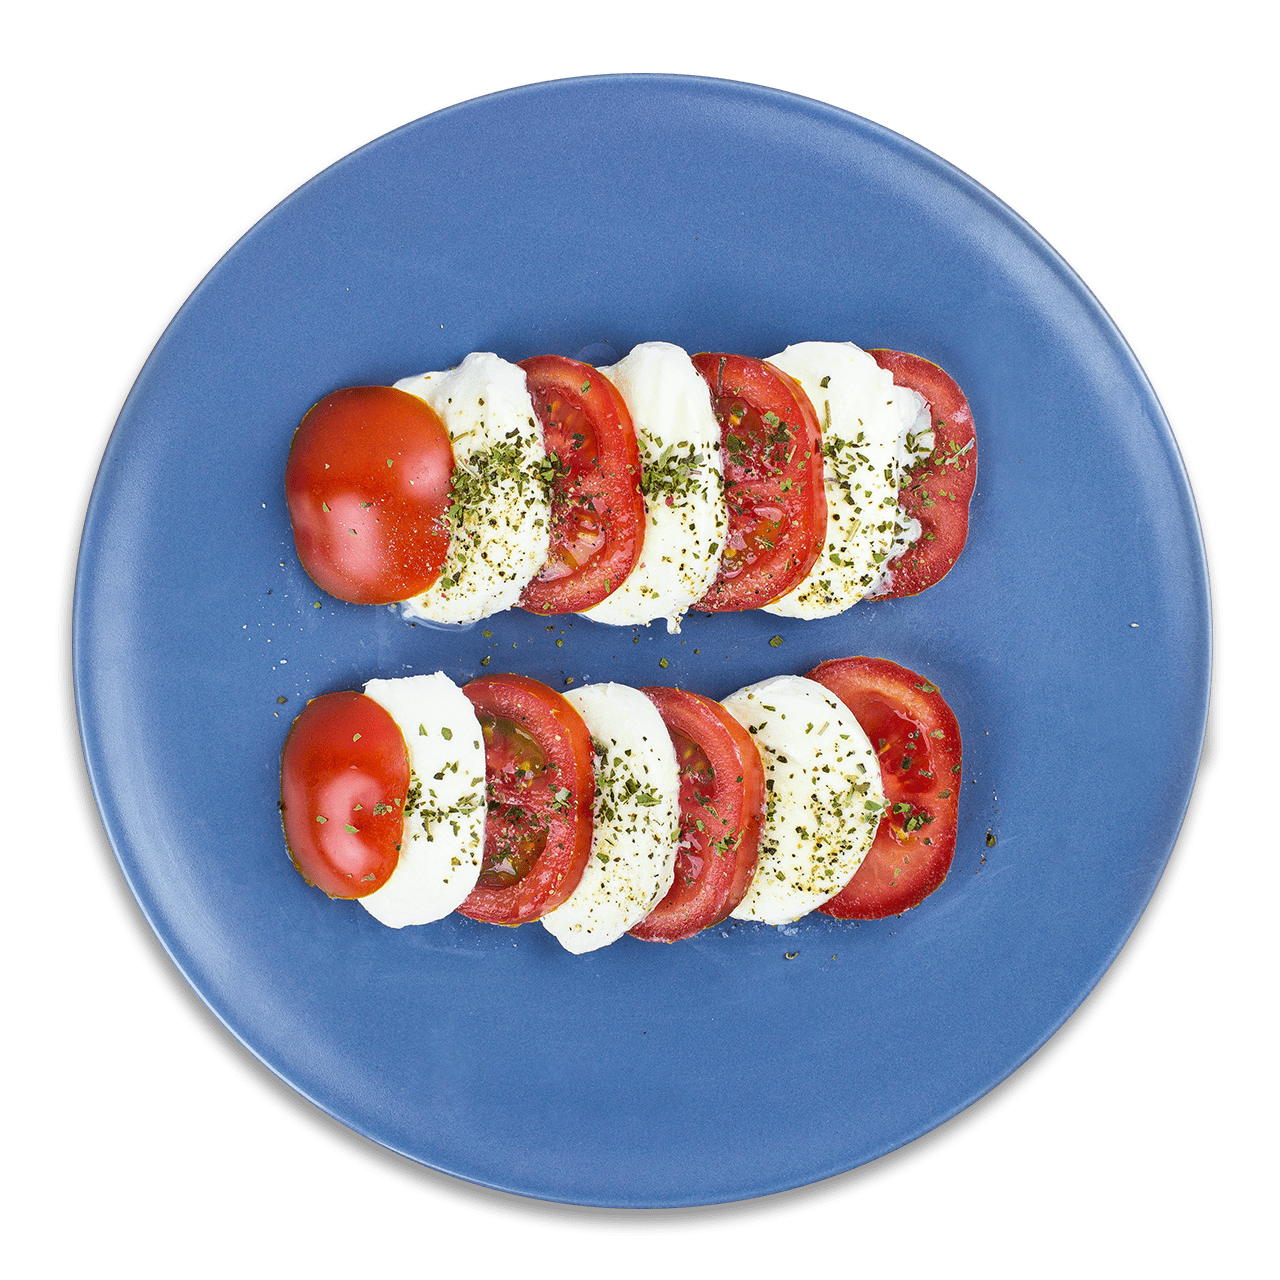 tostibanaan-mozzarella-tomaat